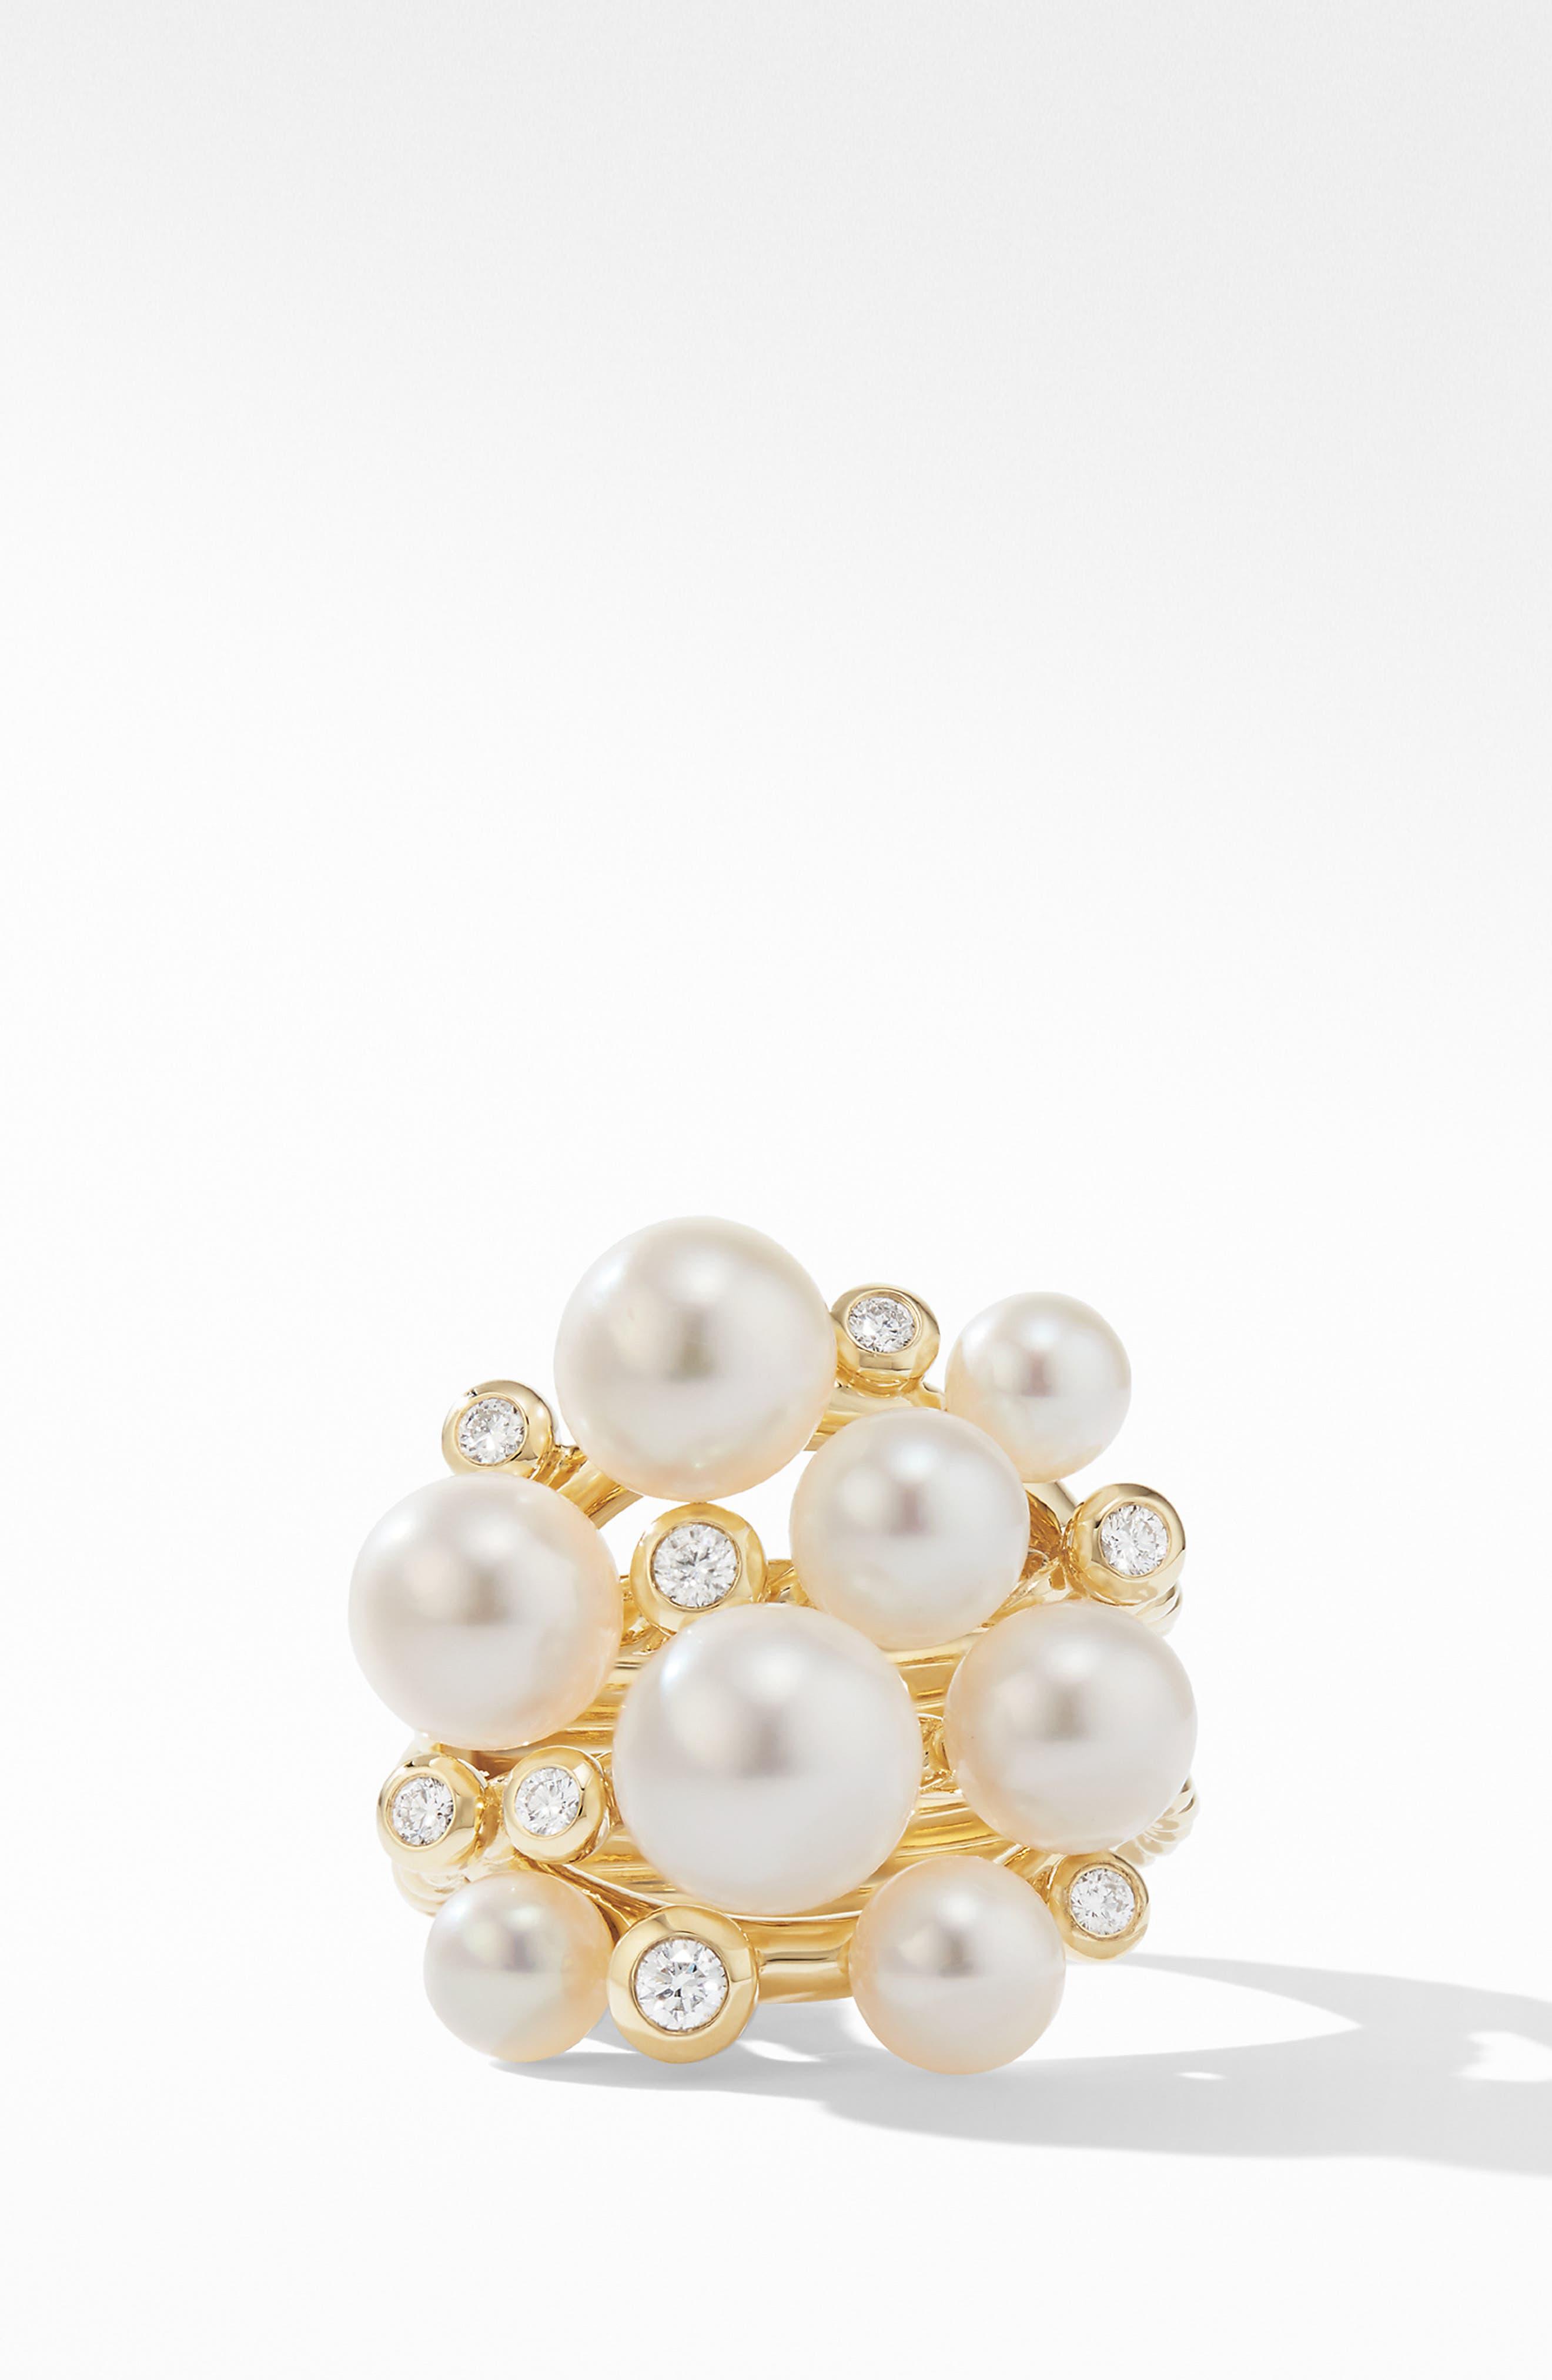 DAVID YURMAN, Large Pearl Cluster Ring with Diamonds, Alternate thumbnail 2, color, YELLOW GOLD/ DIAMOND/ PEARL